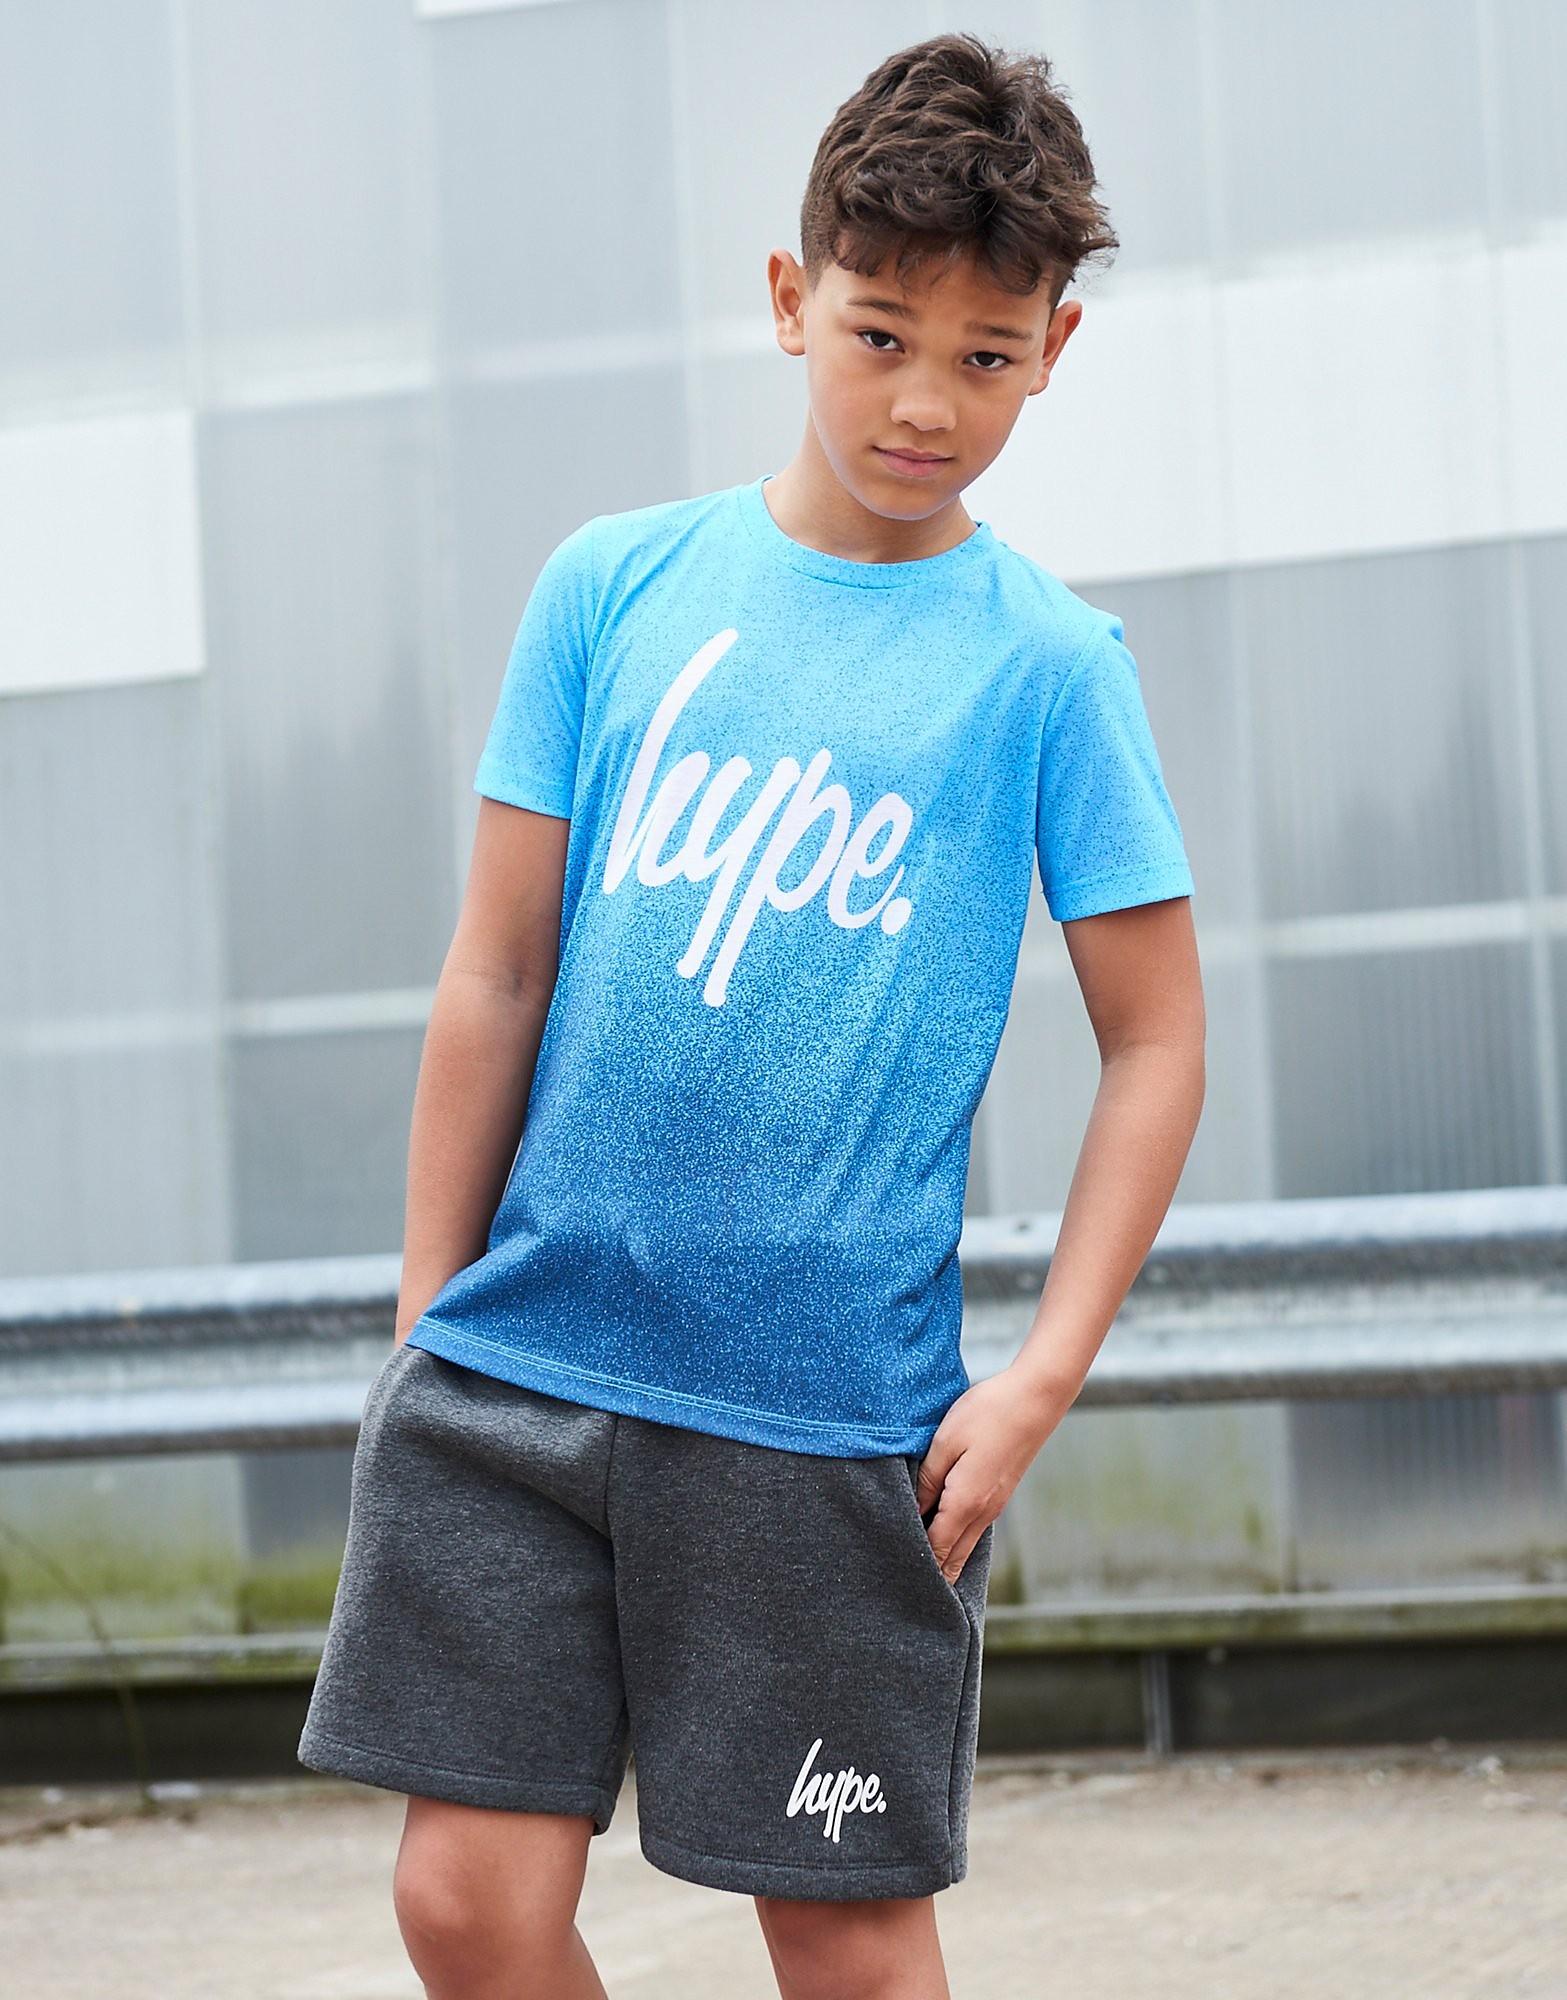 Hype Blue Fade Speckle T-Shirt Junior